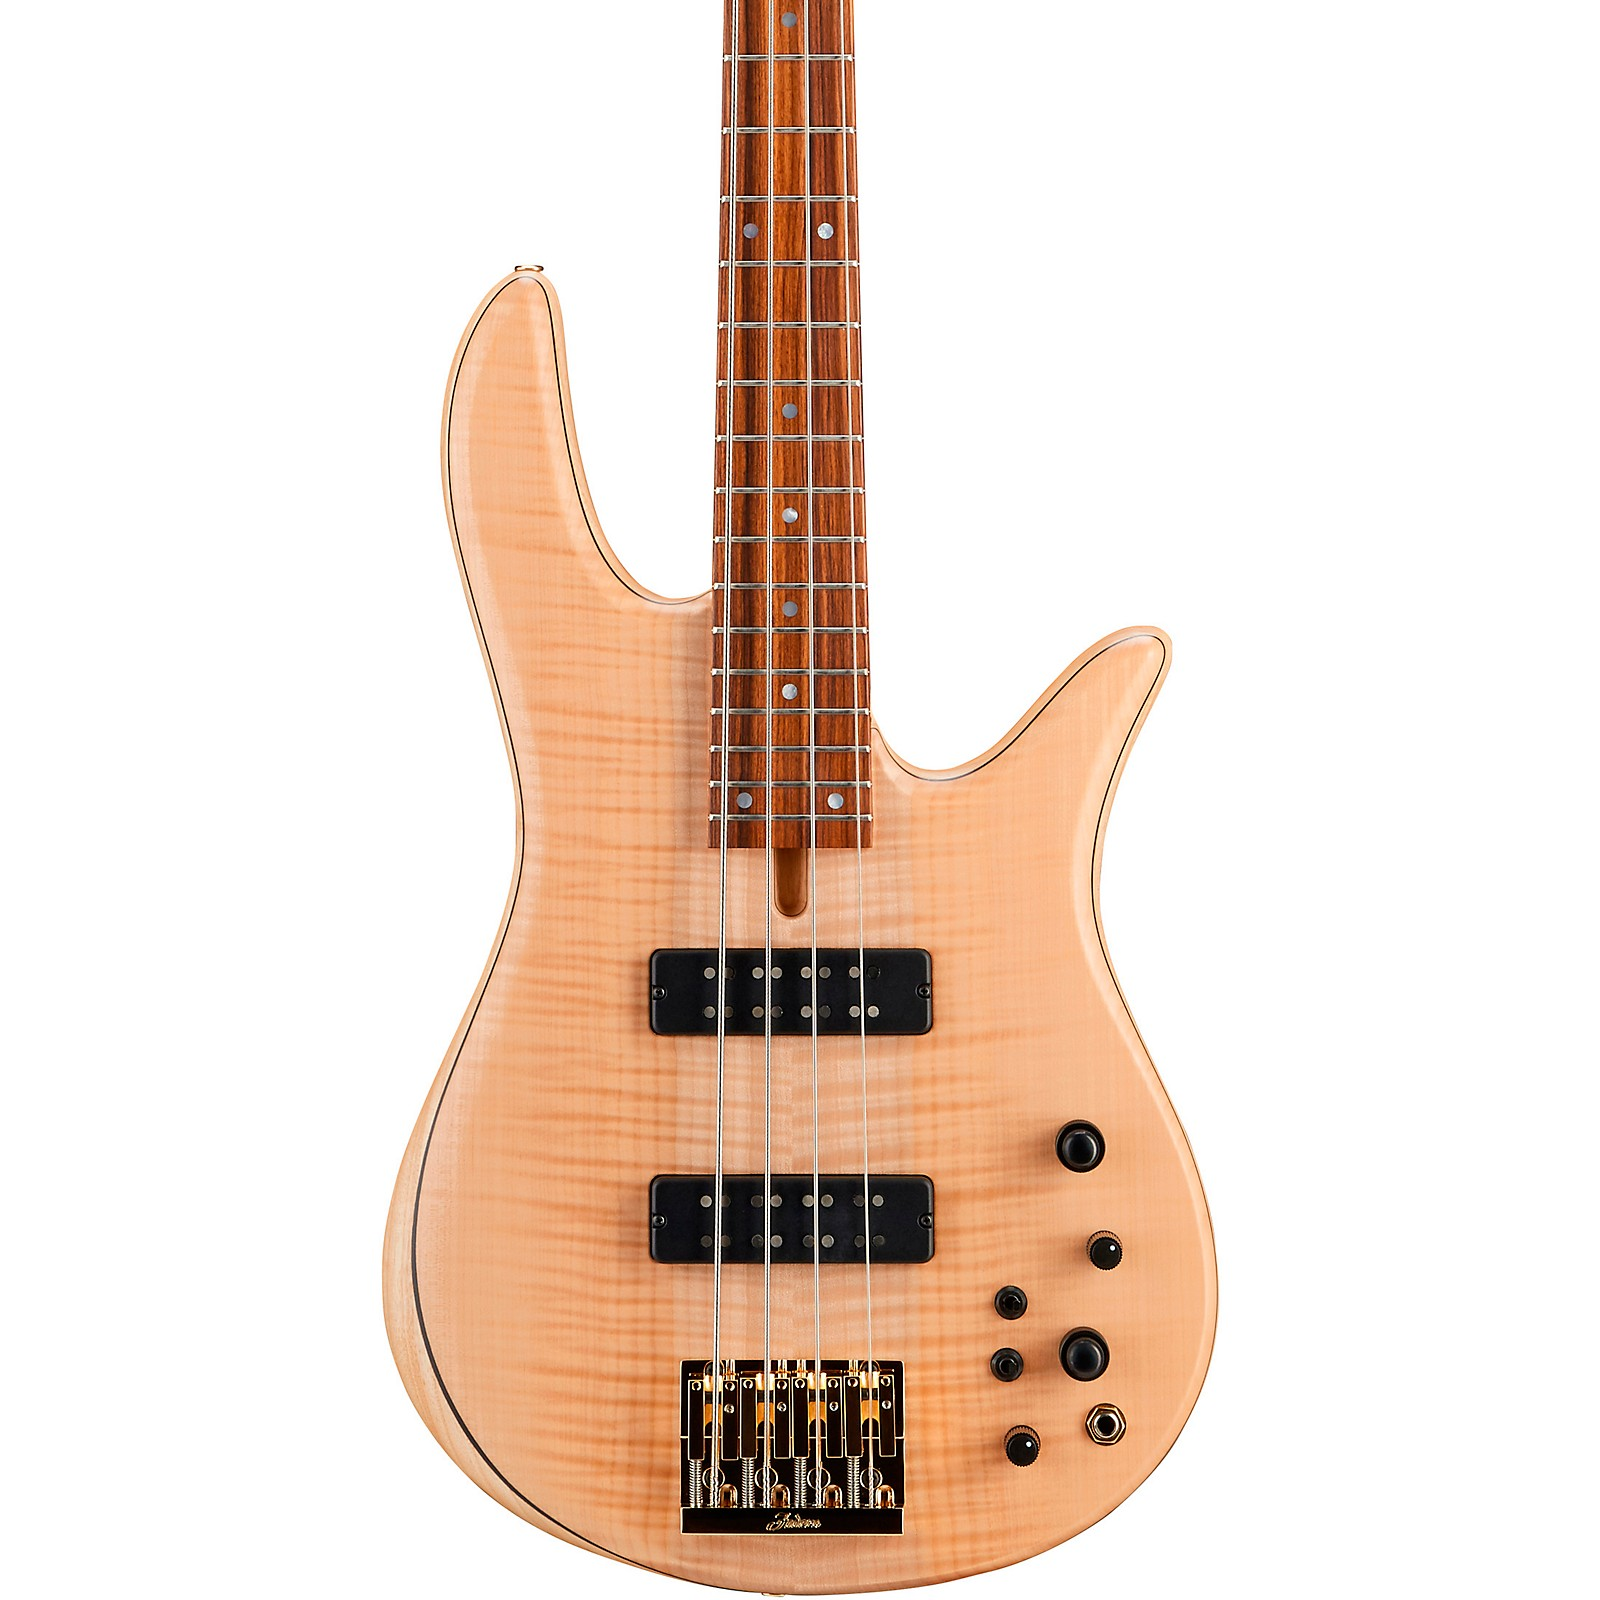 Fodera Guitars Monarch 4 Standard Electric Bass